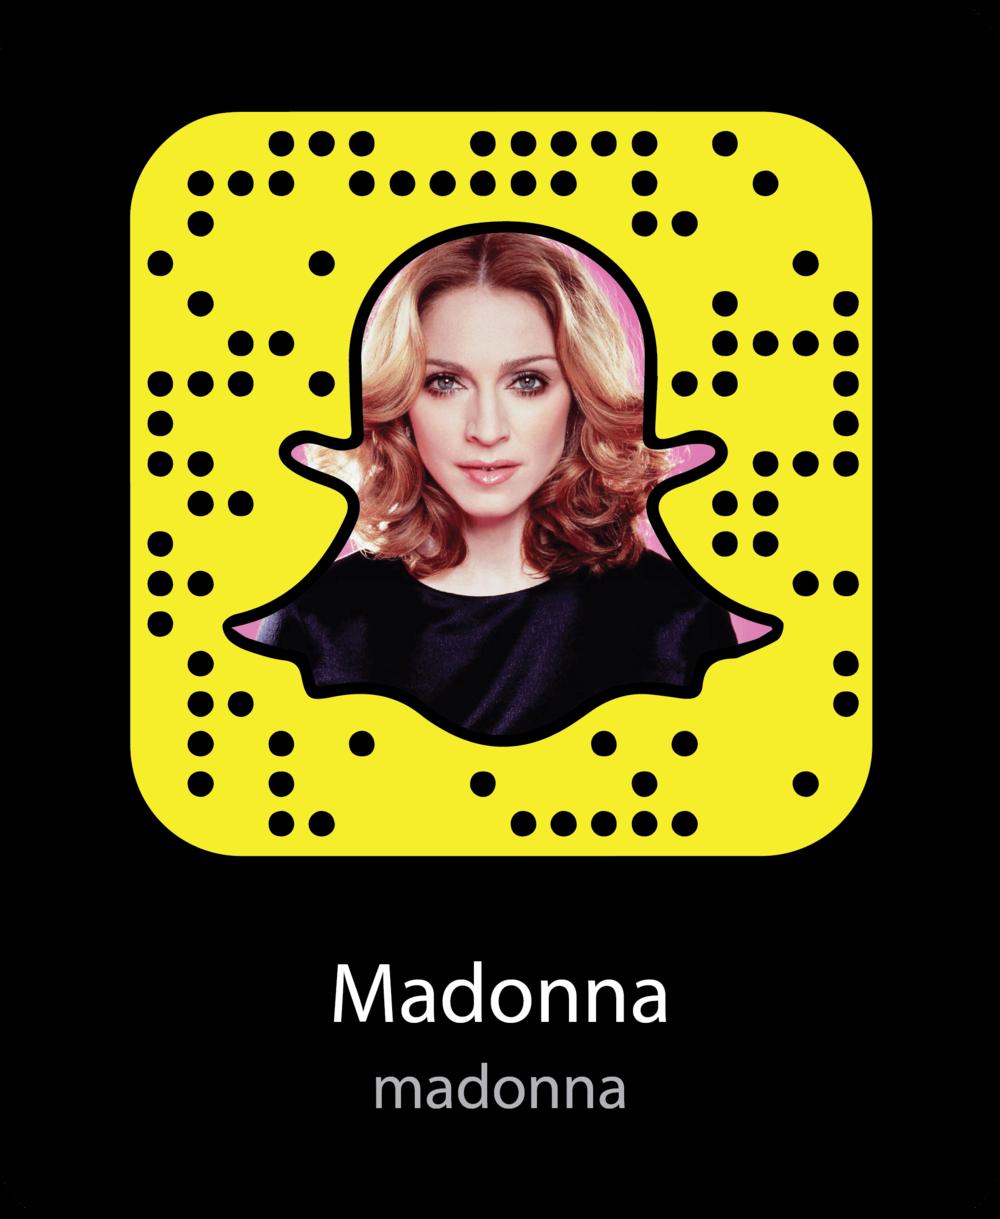 madonna-celebrity-snapchat-snapcode